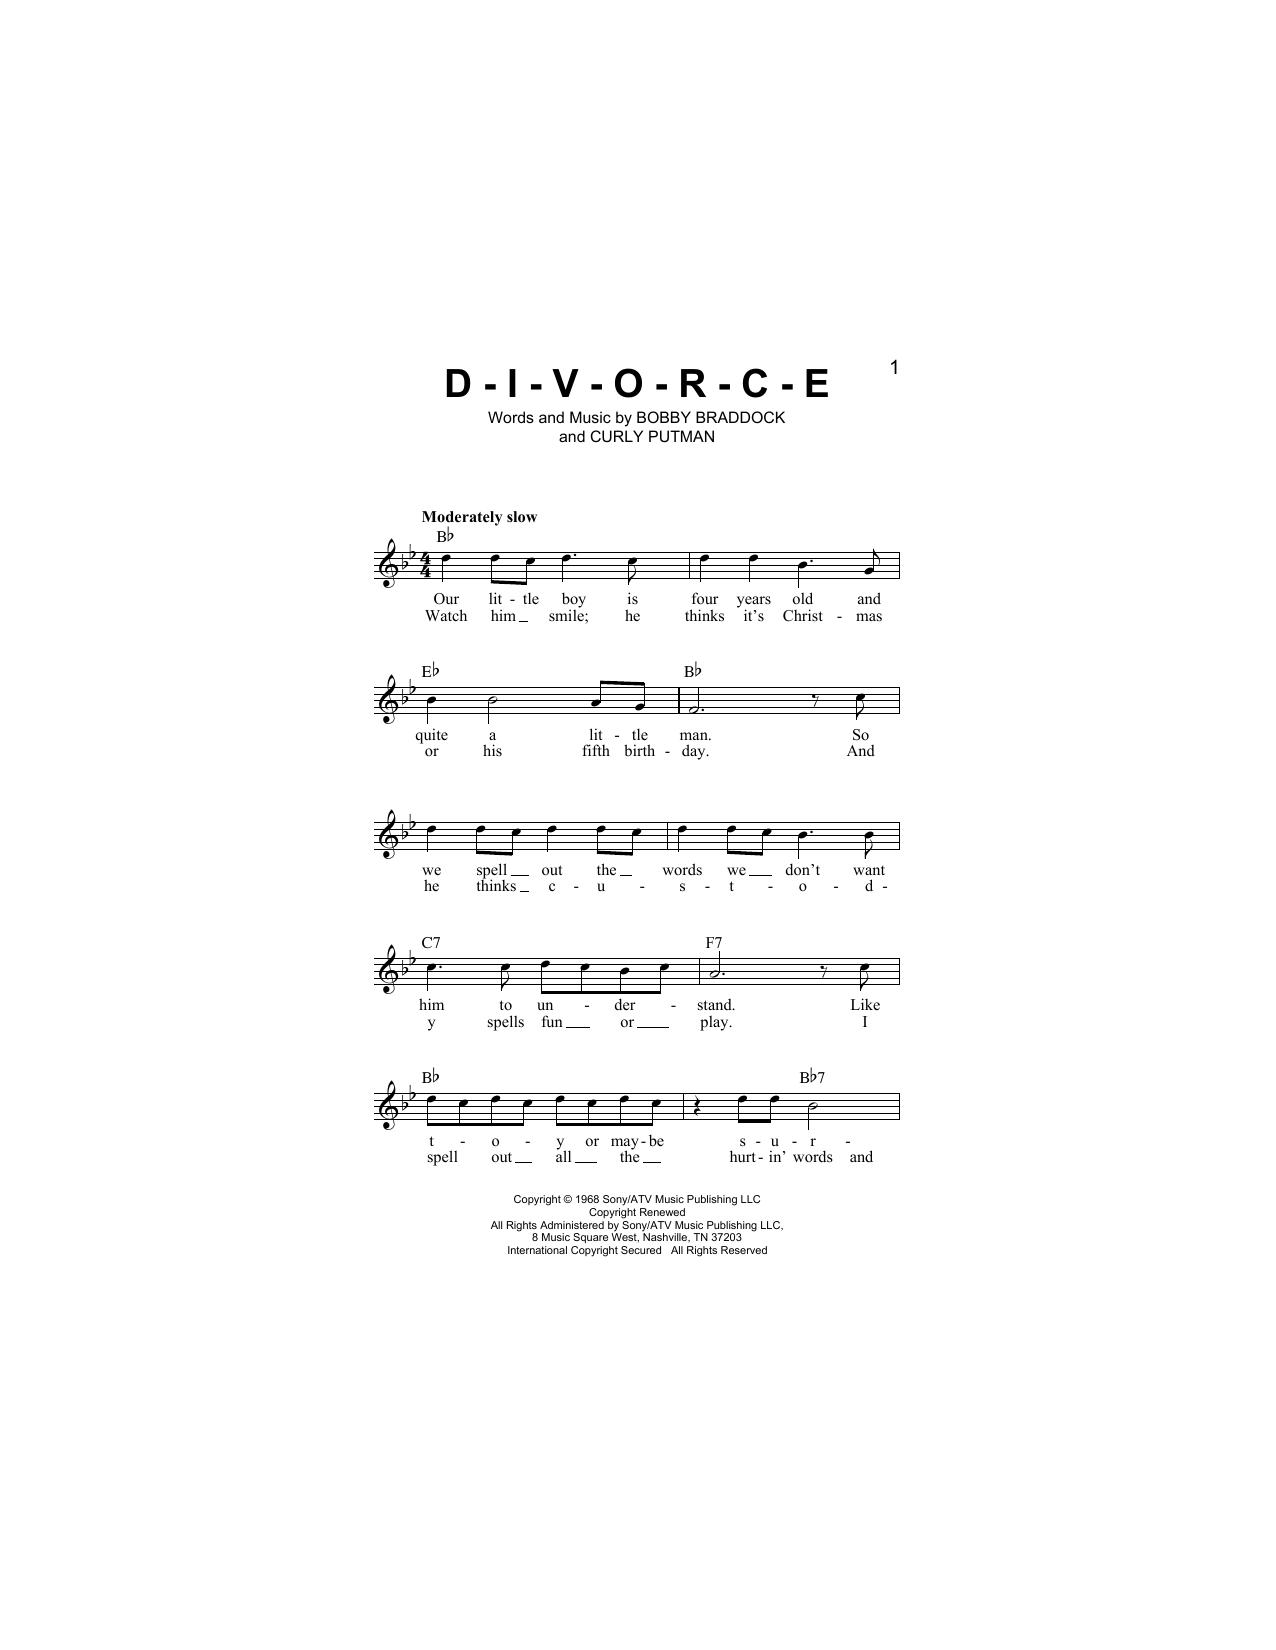 D-I-V-O-R-C-E Sheet Music